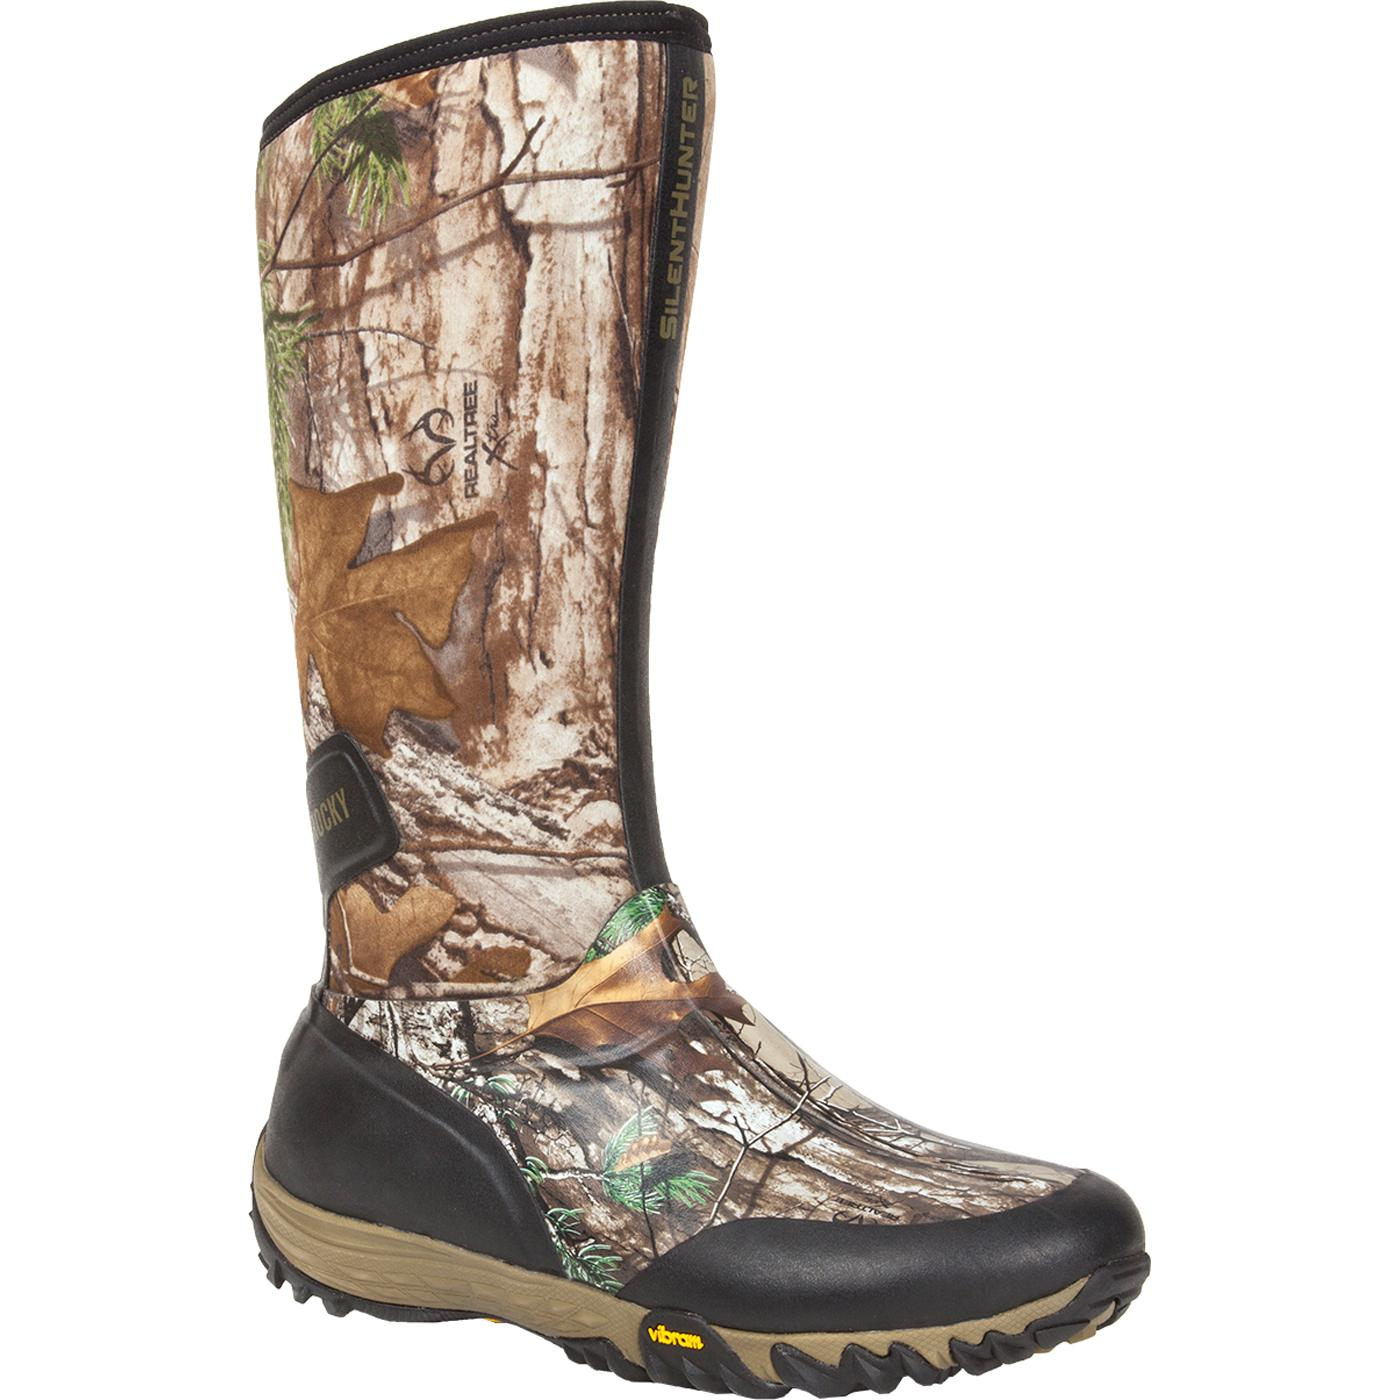 Waterproof Insulated Camo Rubber Boot, Rocky SilentHunter